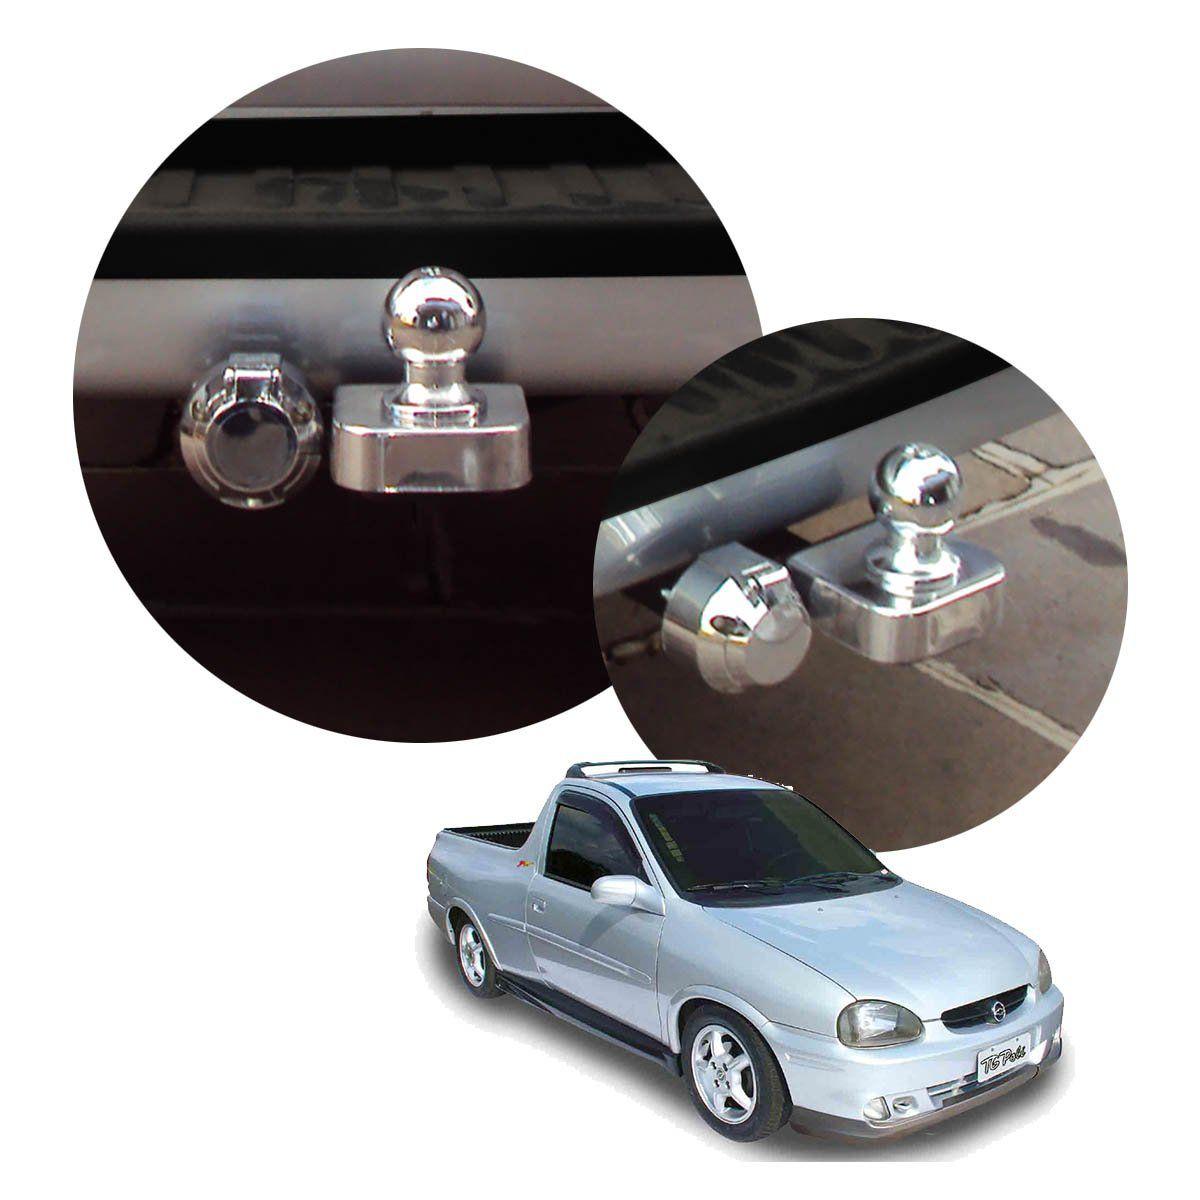 Engate de reboque fixo Pick up Corsa 1995 a 2003